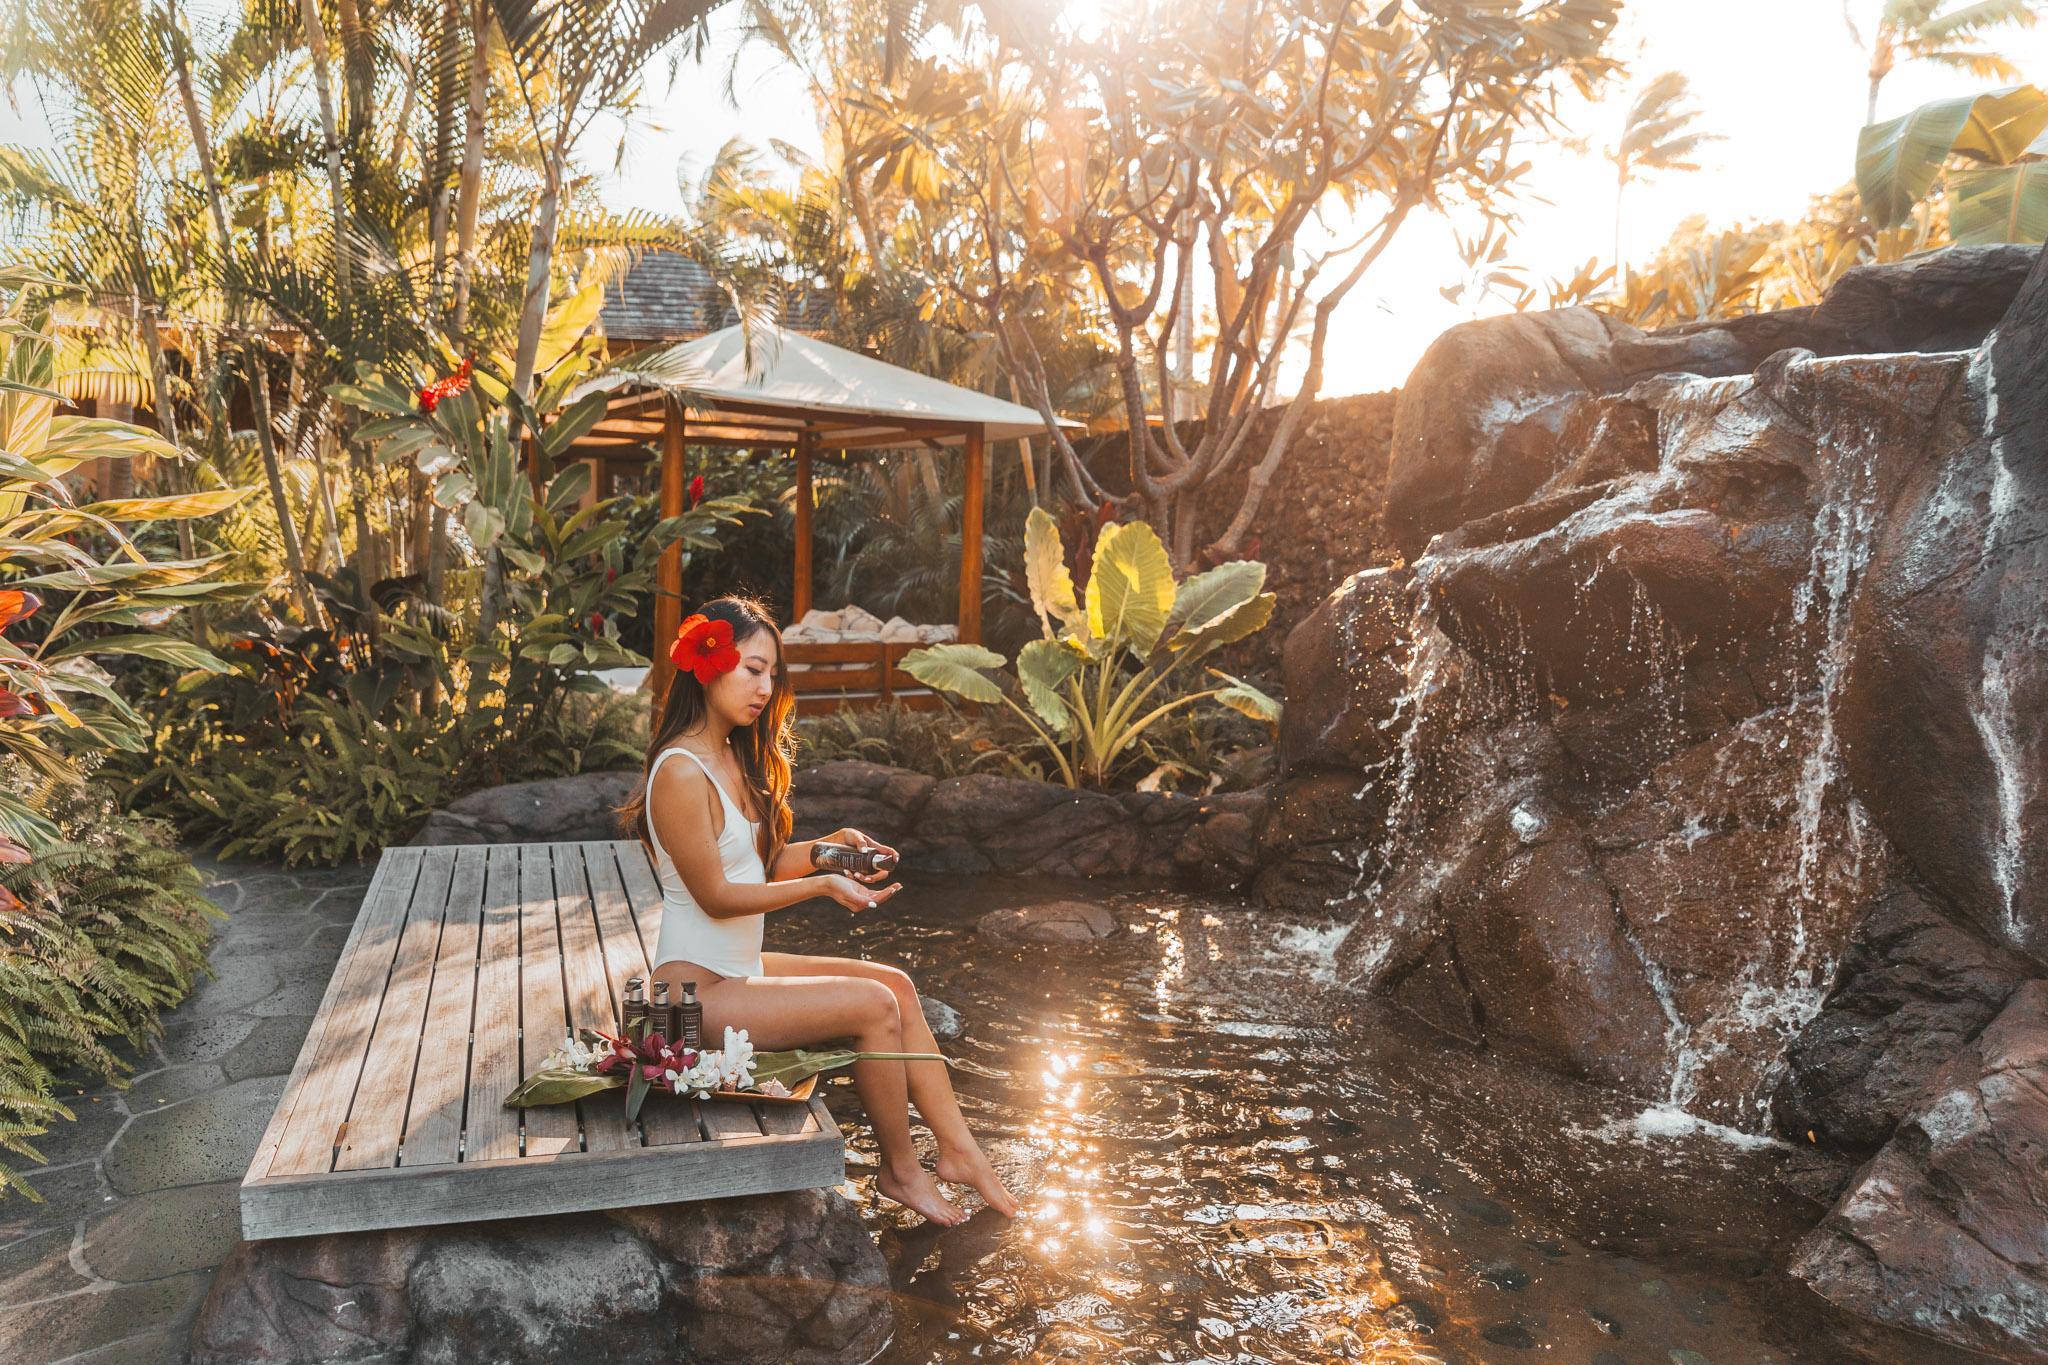 Waiea Garden at Hualalai Spa // A Luxury Stay on the Big Island: Four Seasons Resort Hualalai // #readysetjetset #hawaii #bigisland #luxuryhotels #beachresorts #usa #travel